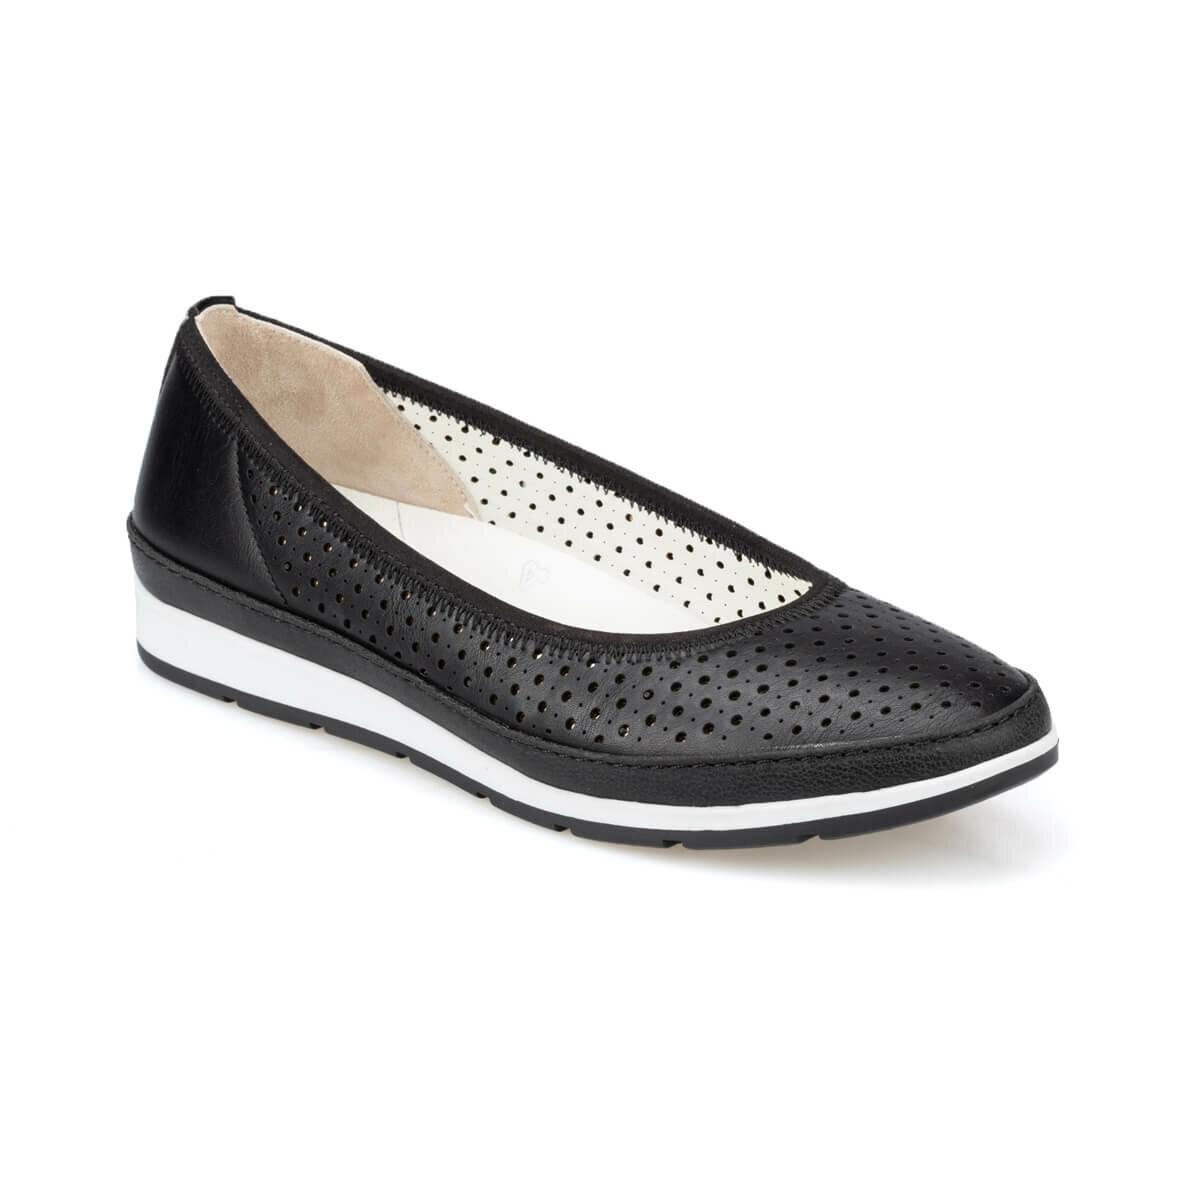 FLO 91. 100689.Z Black Women Shoes Polaris 5 Point